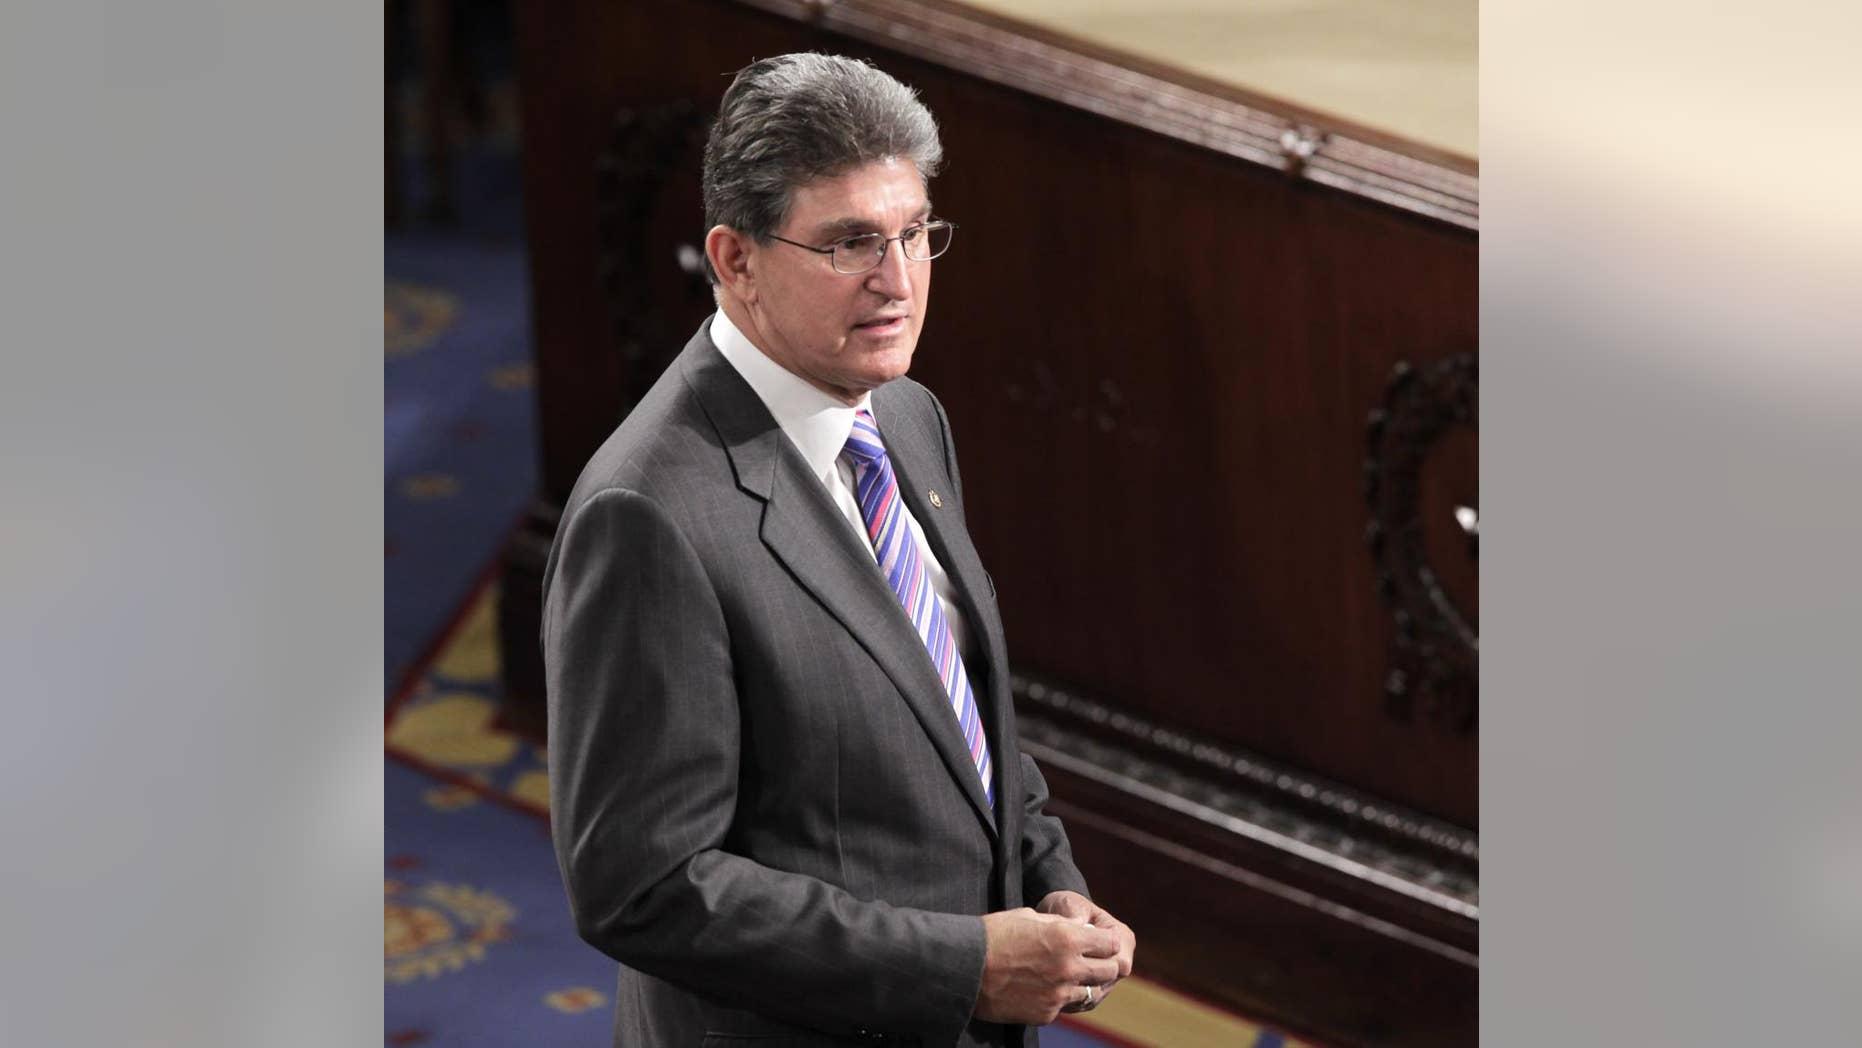 Sen. Joe Manchin, D-W.Va., in the U.S. Senate